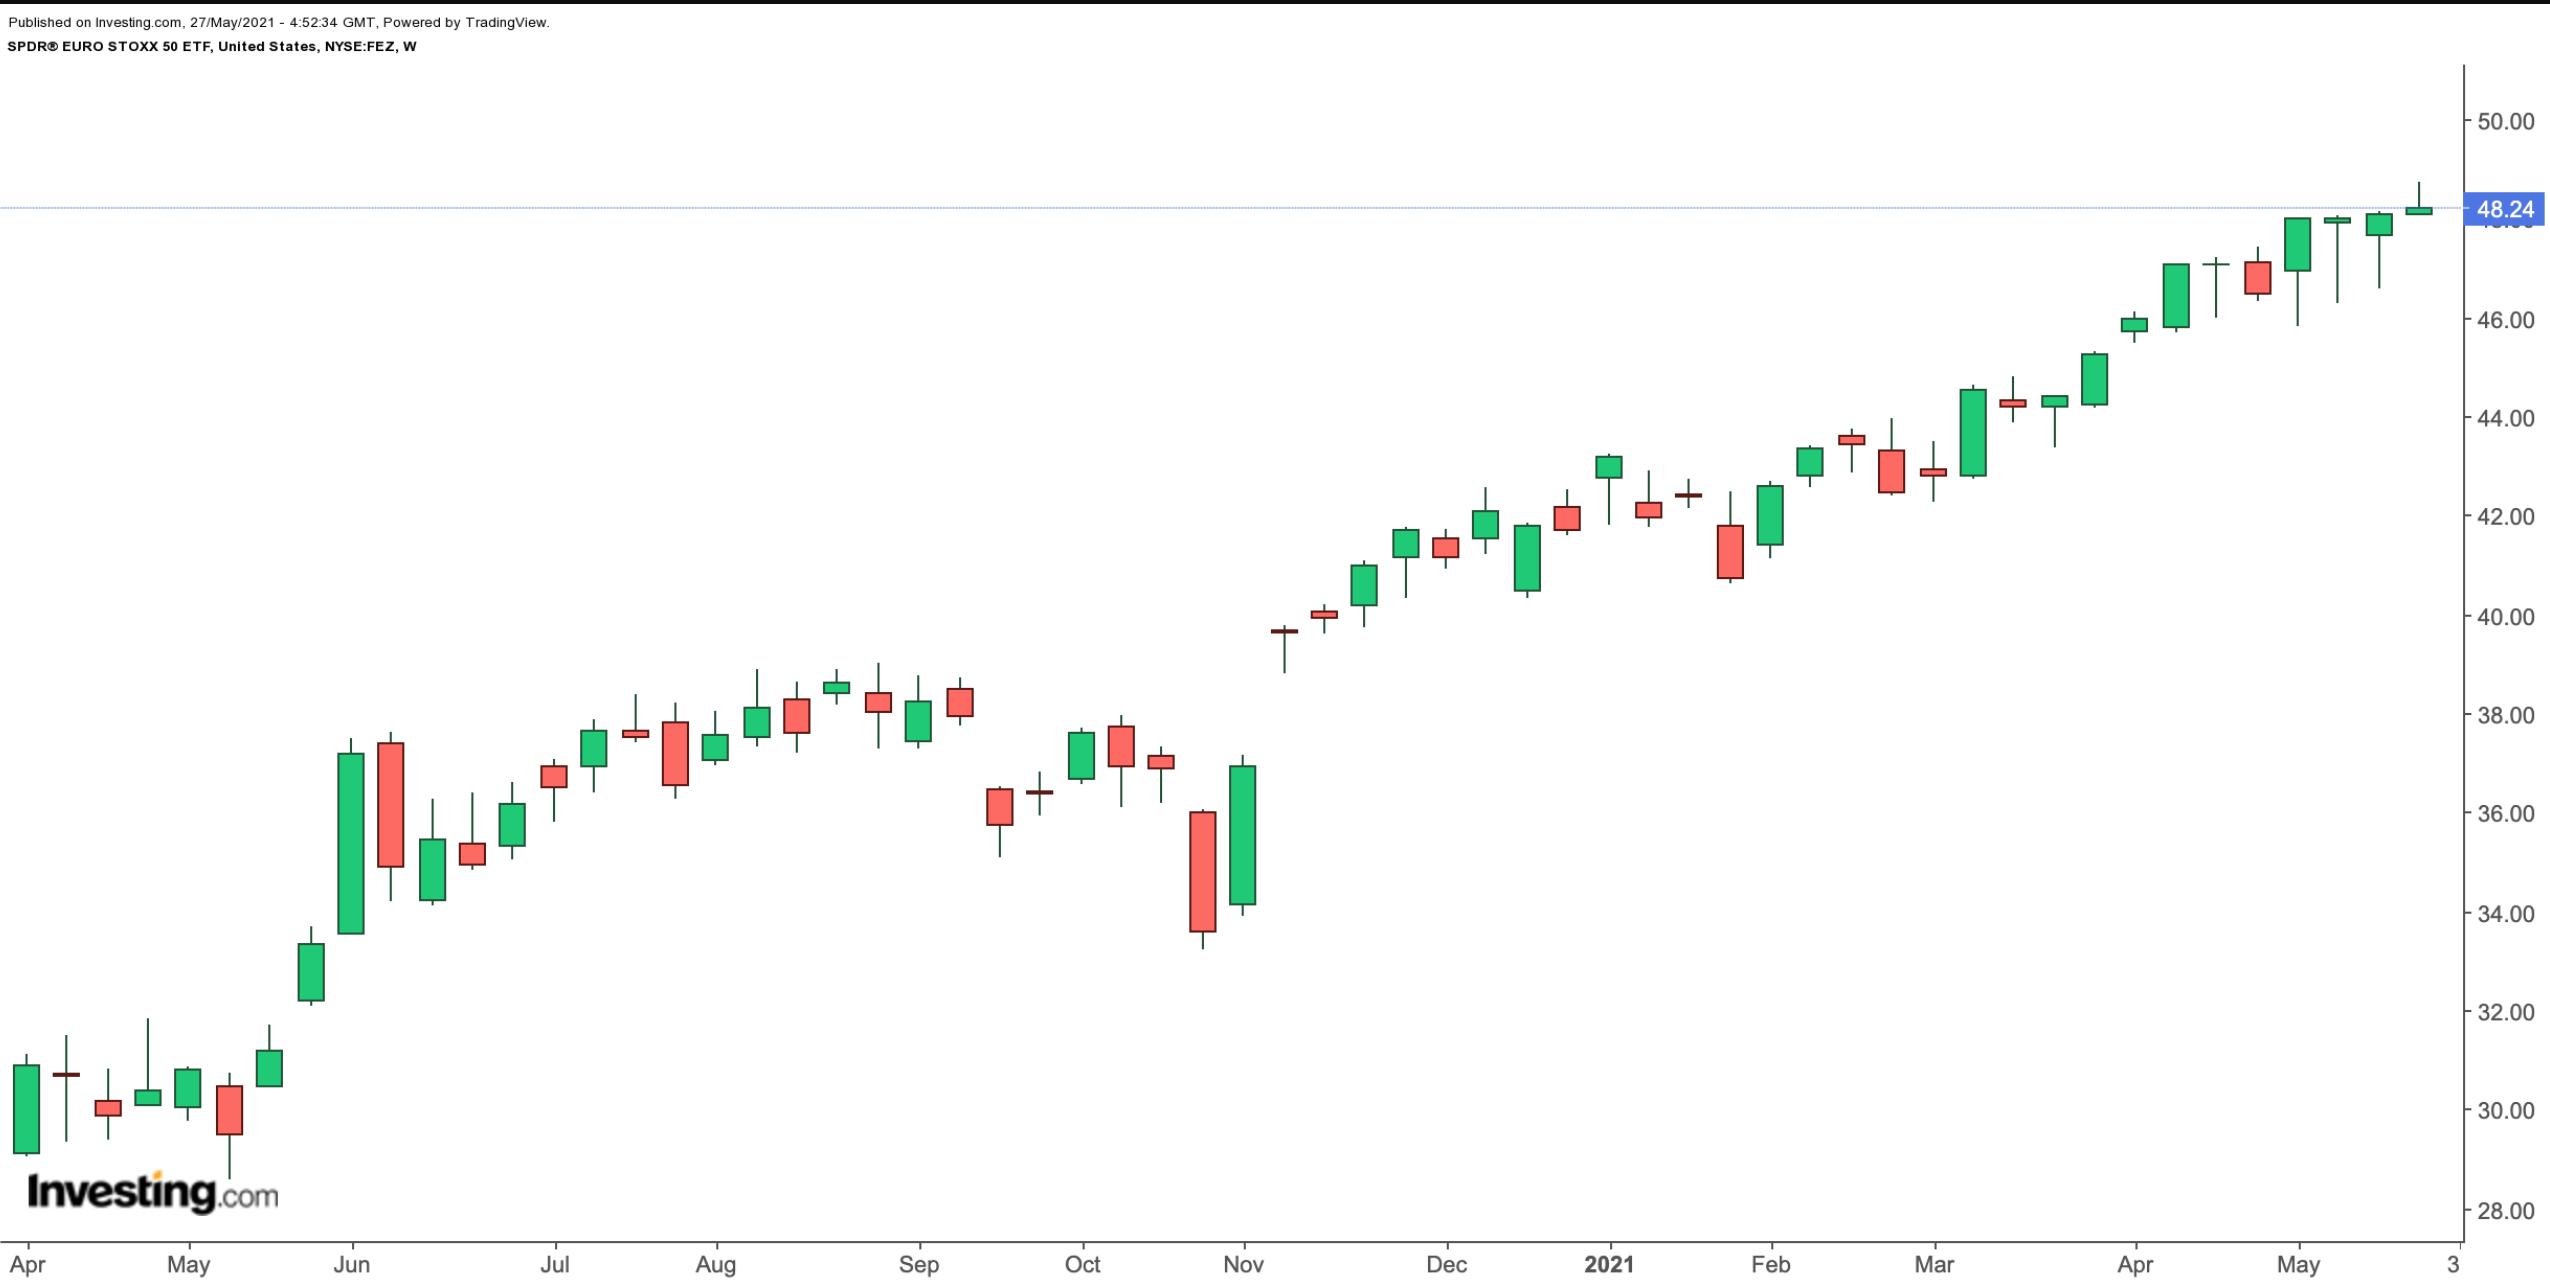 SPDR® EURO STOXX 50 ETF 주간 차트